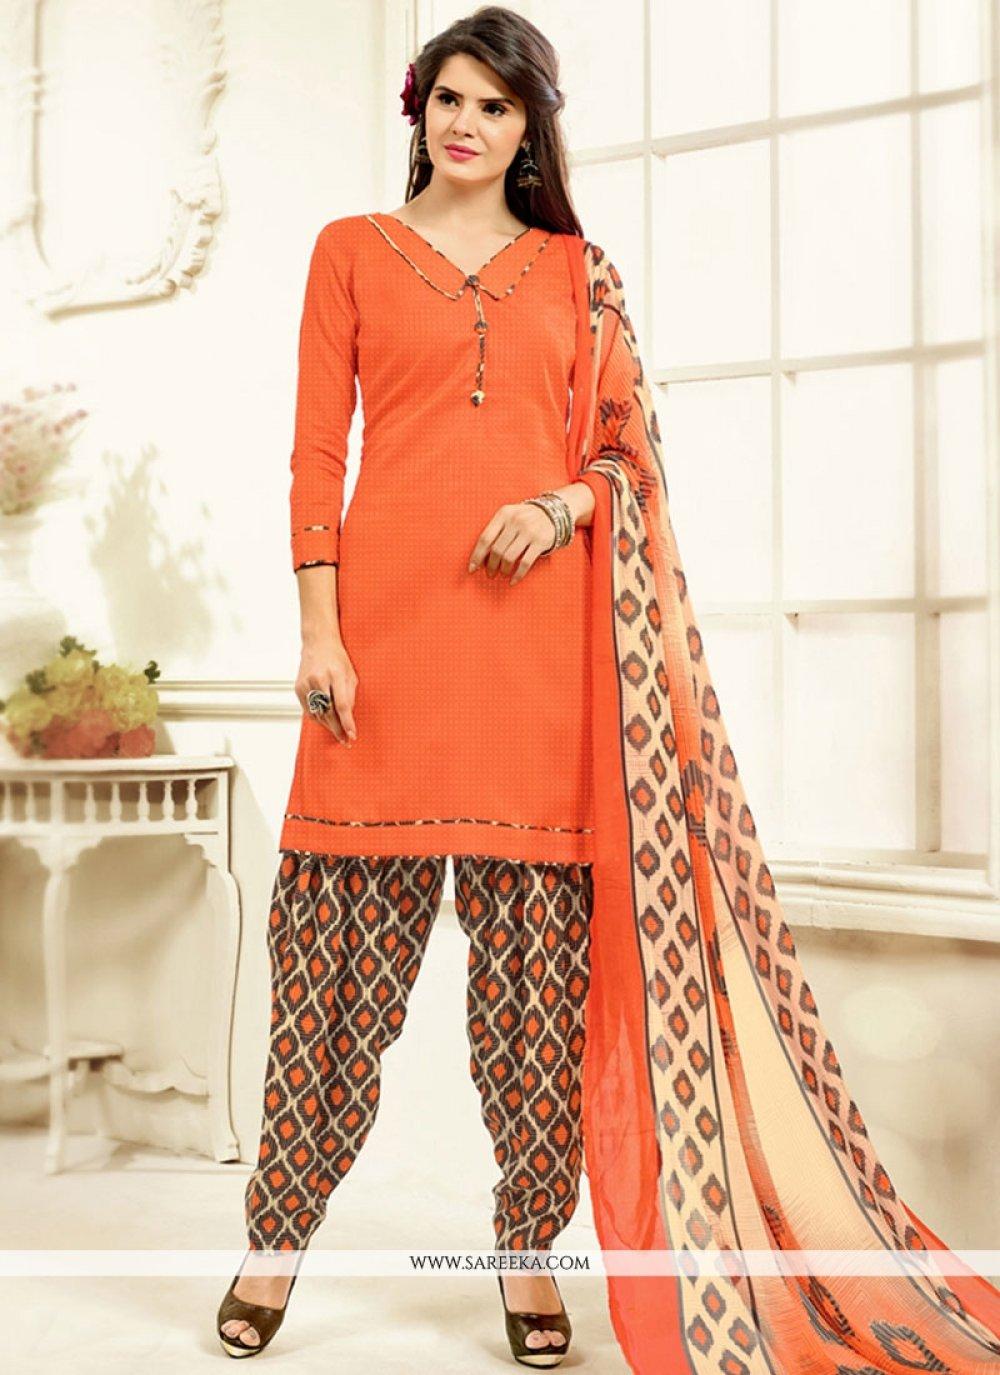 Cotton   Orange Printed Work Work Patiala Salwar Kameez